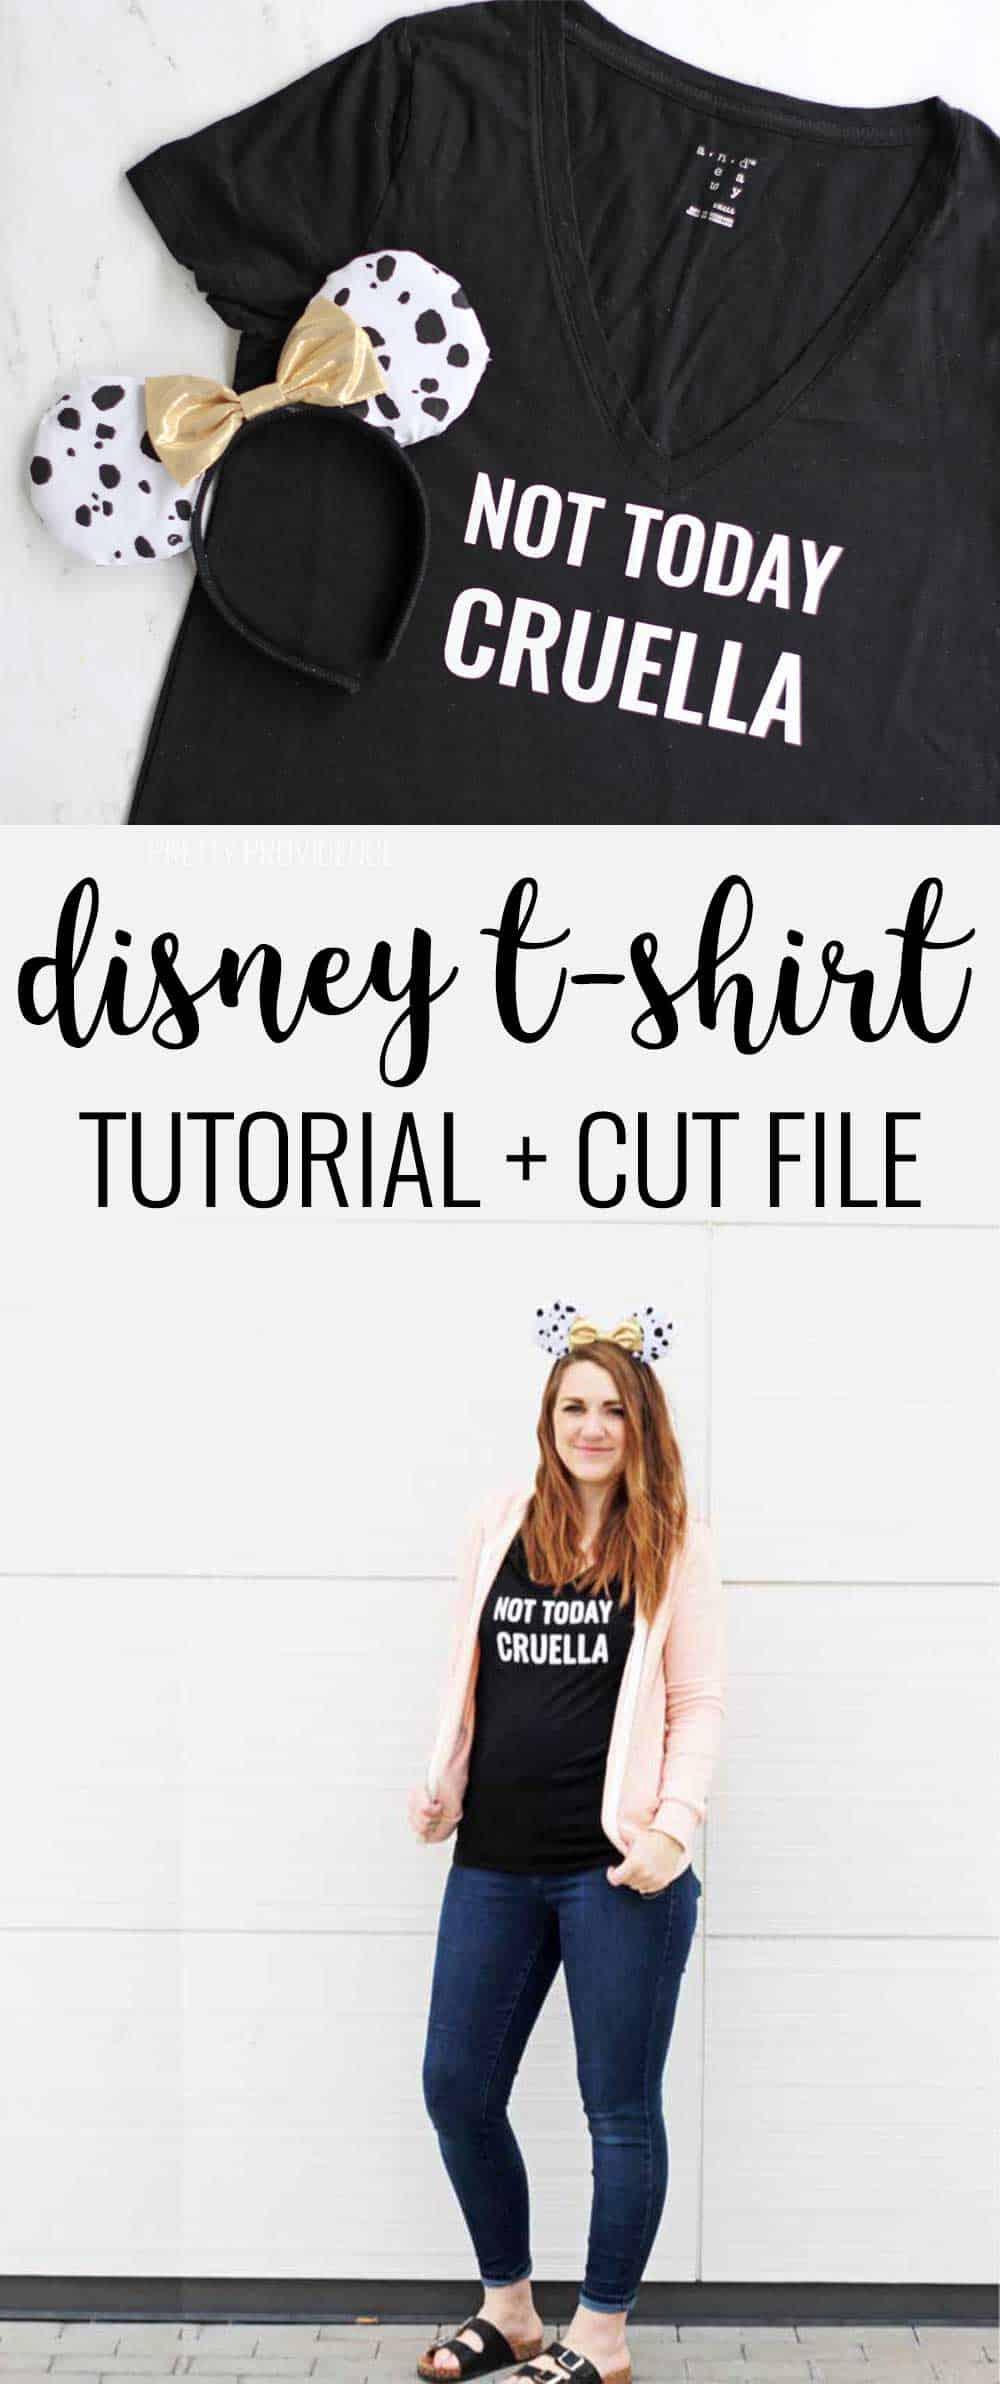 'NOT TODAY CRUELLA' T-Shirt for Disney World or Disneyland!